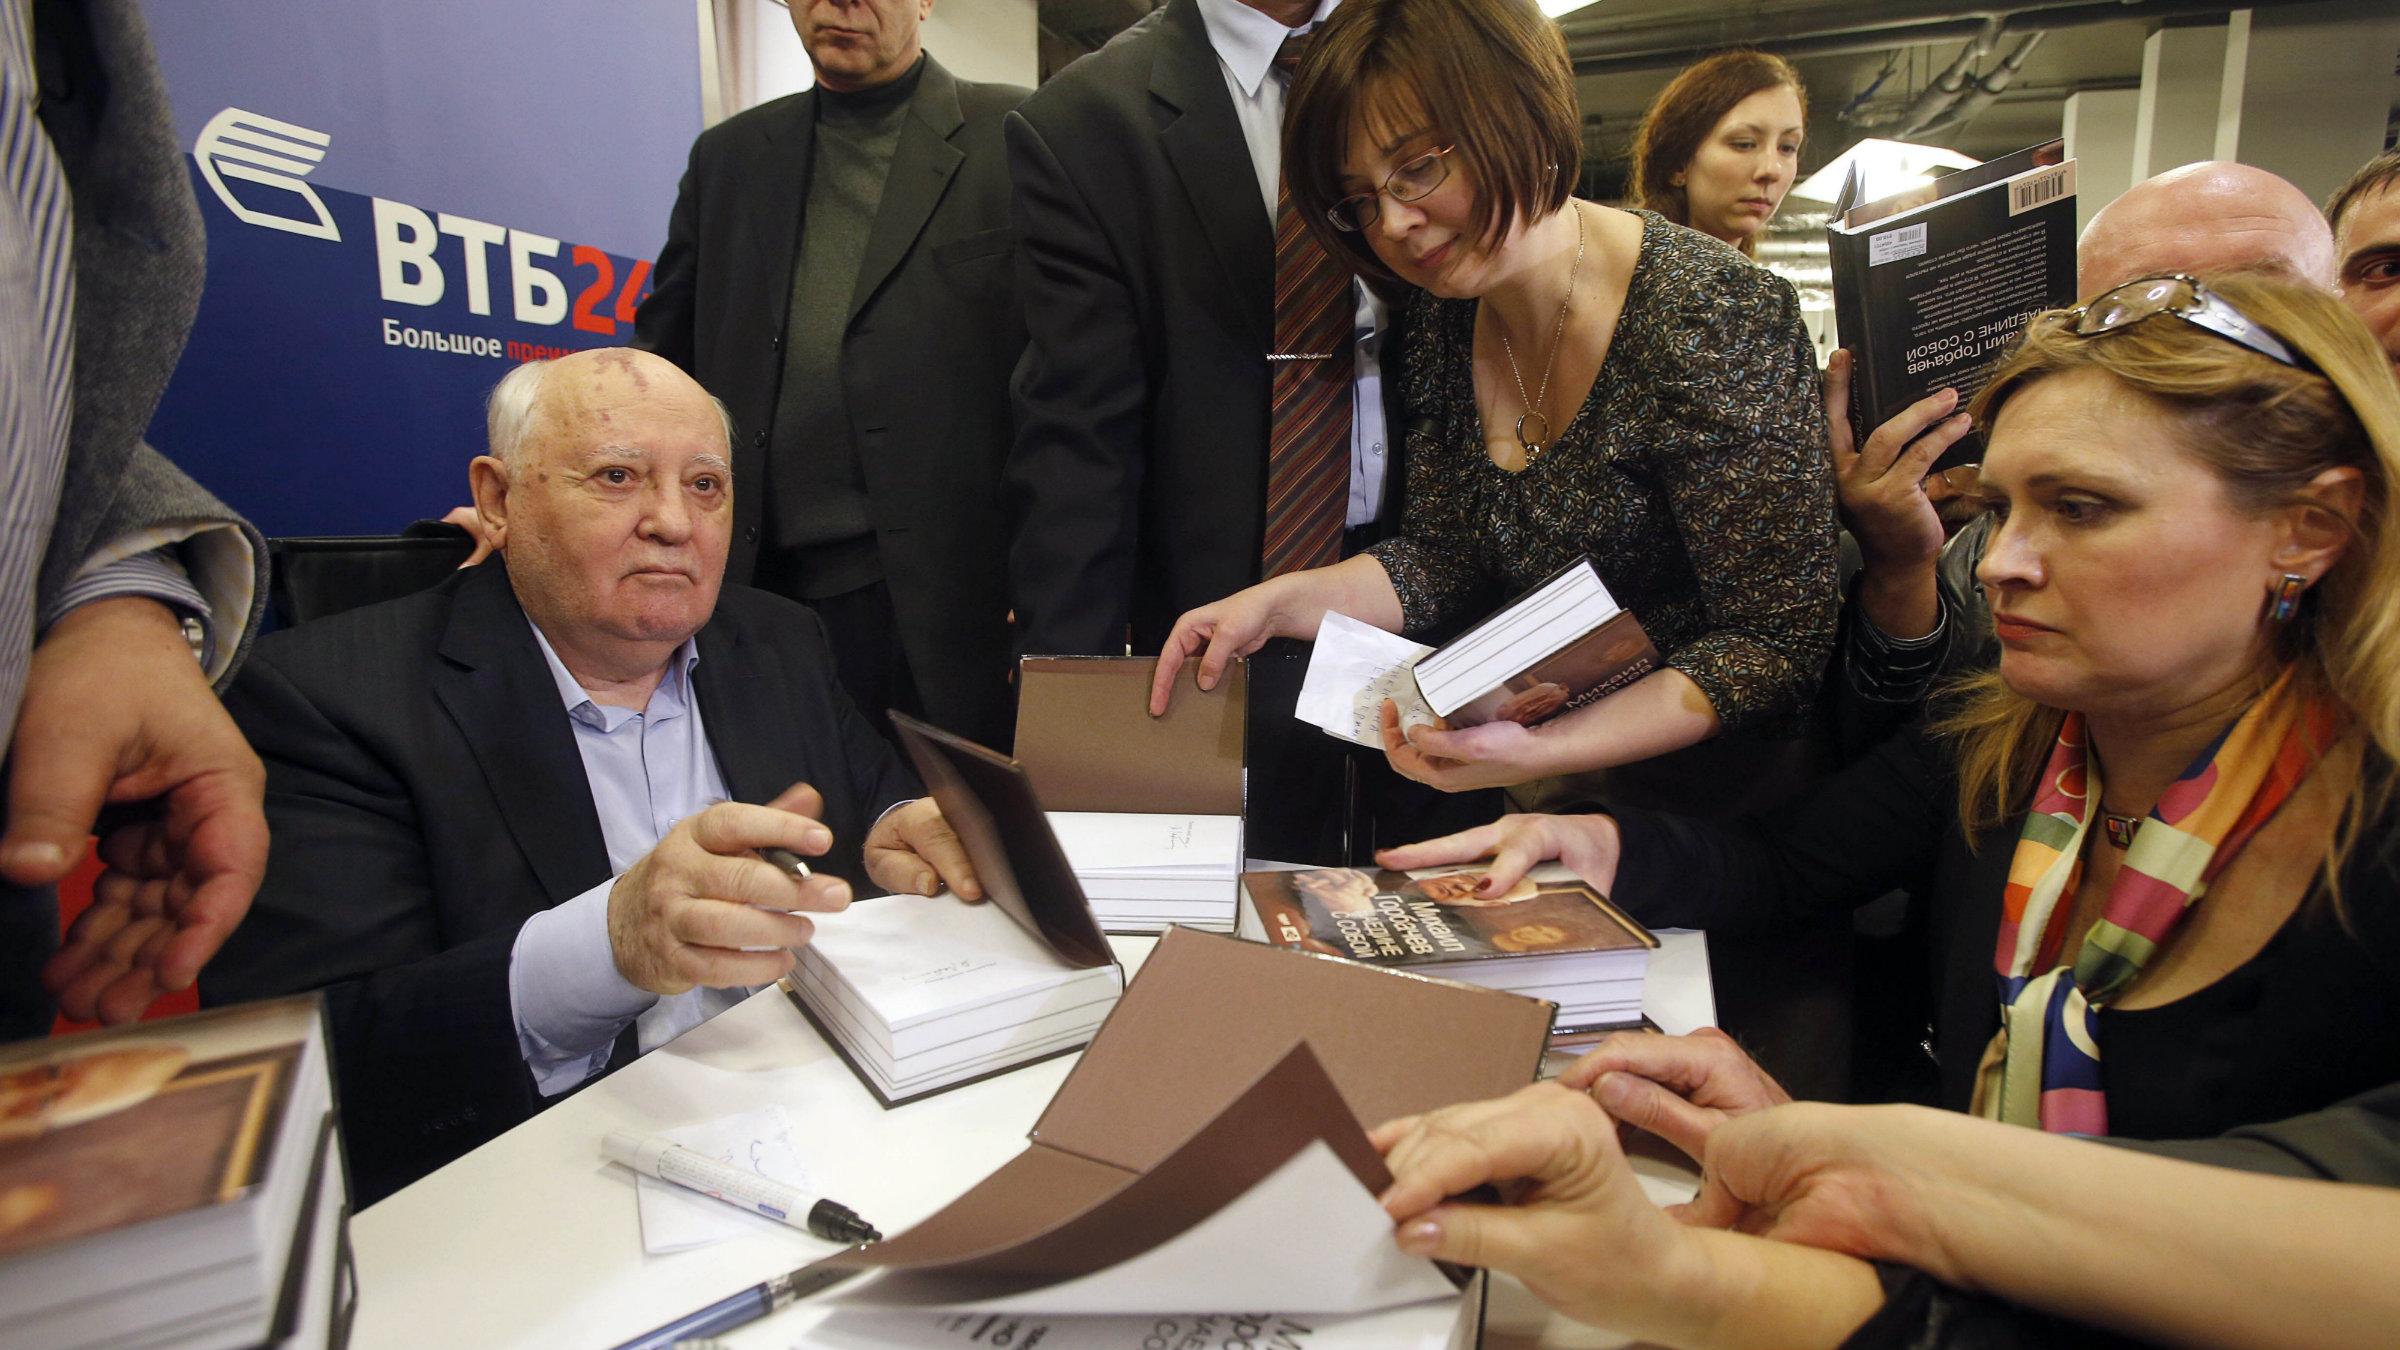 Mikhail Gorbachev signing books